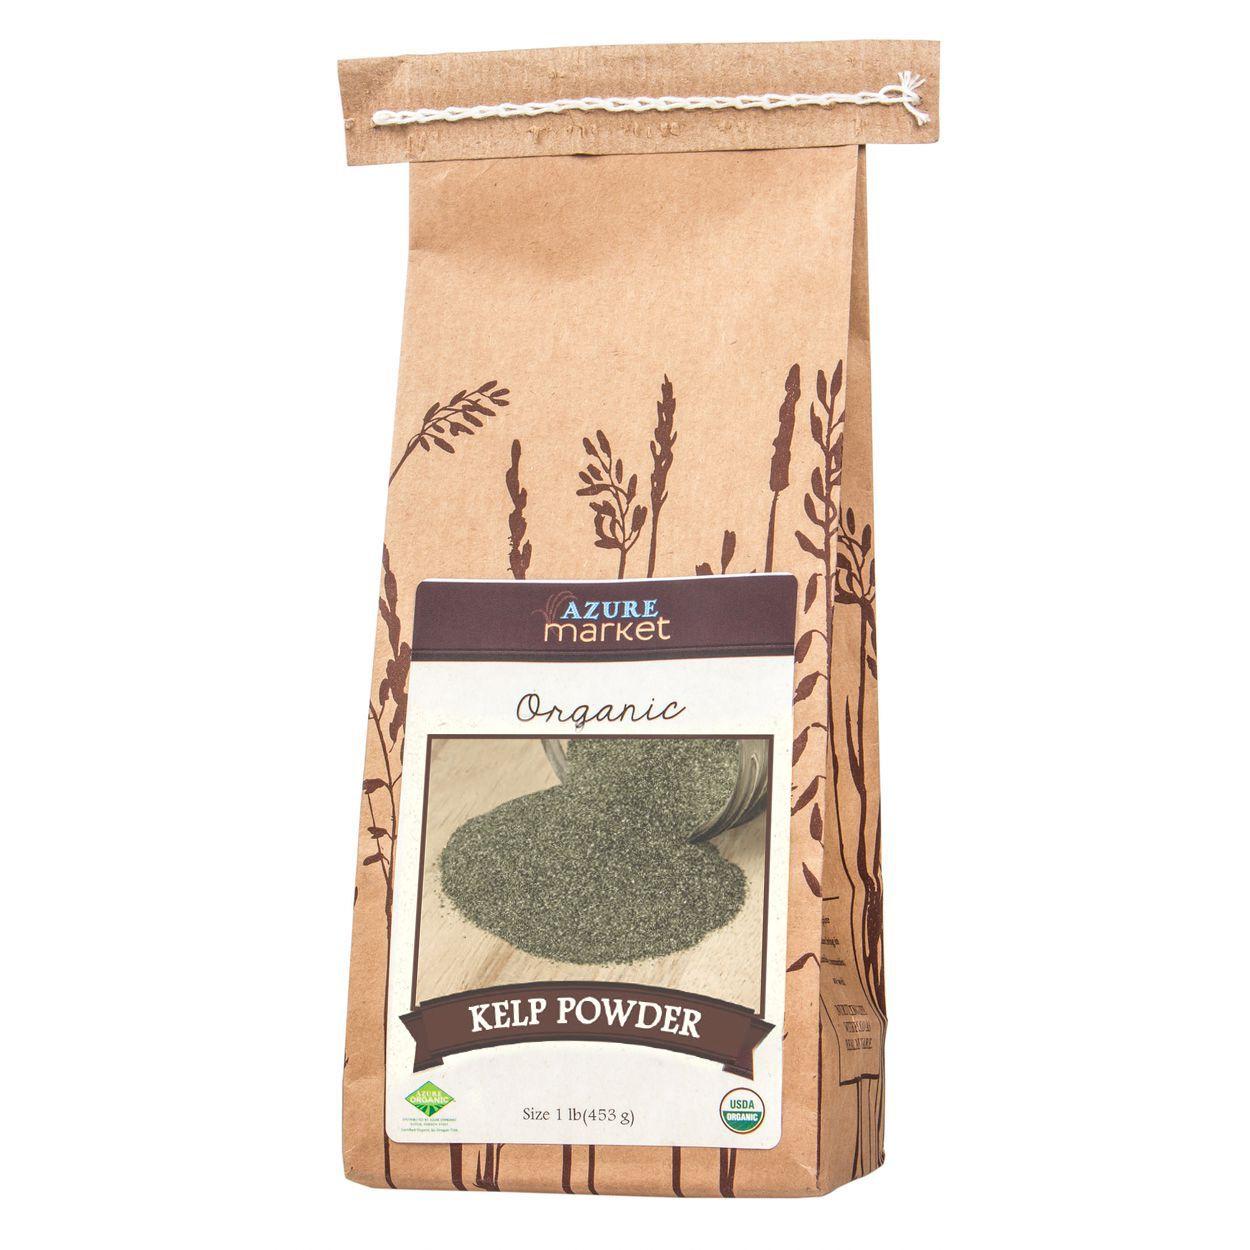 Azure Market Organics Kelp Powder Organic Azure Standard